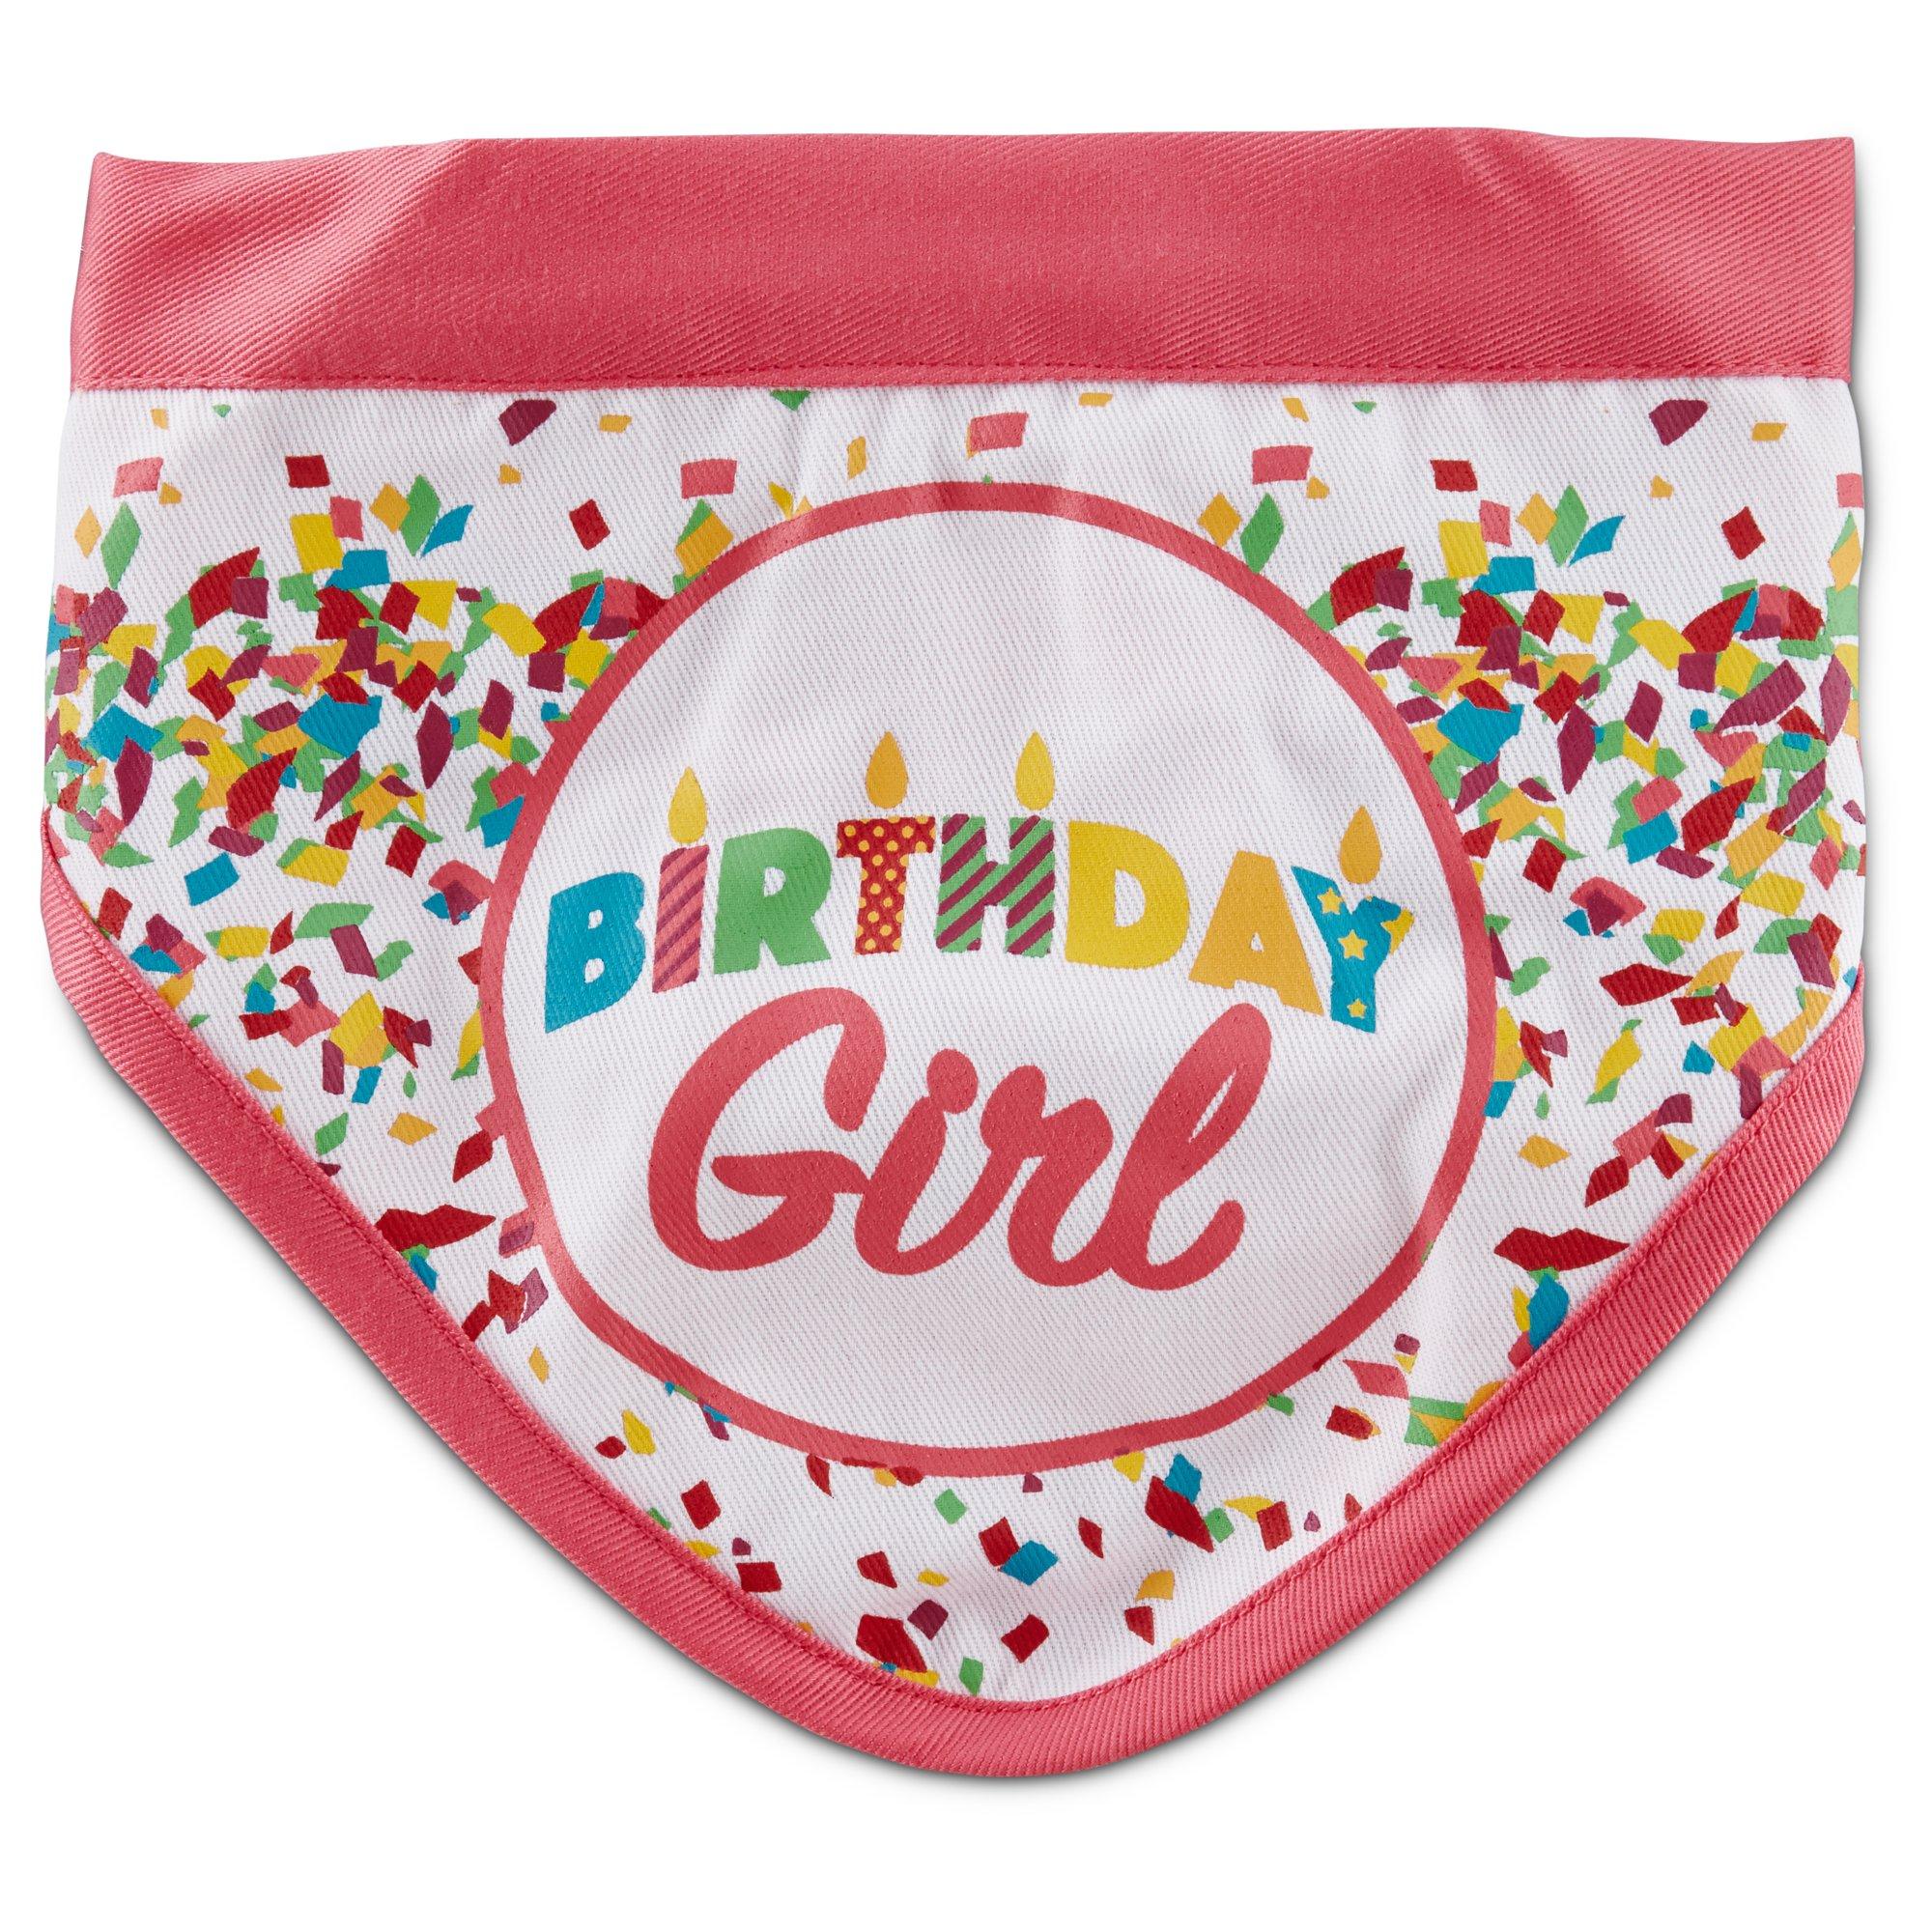 You Me Birthday Girl Dog Bandana